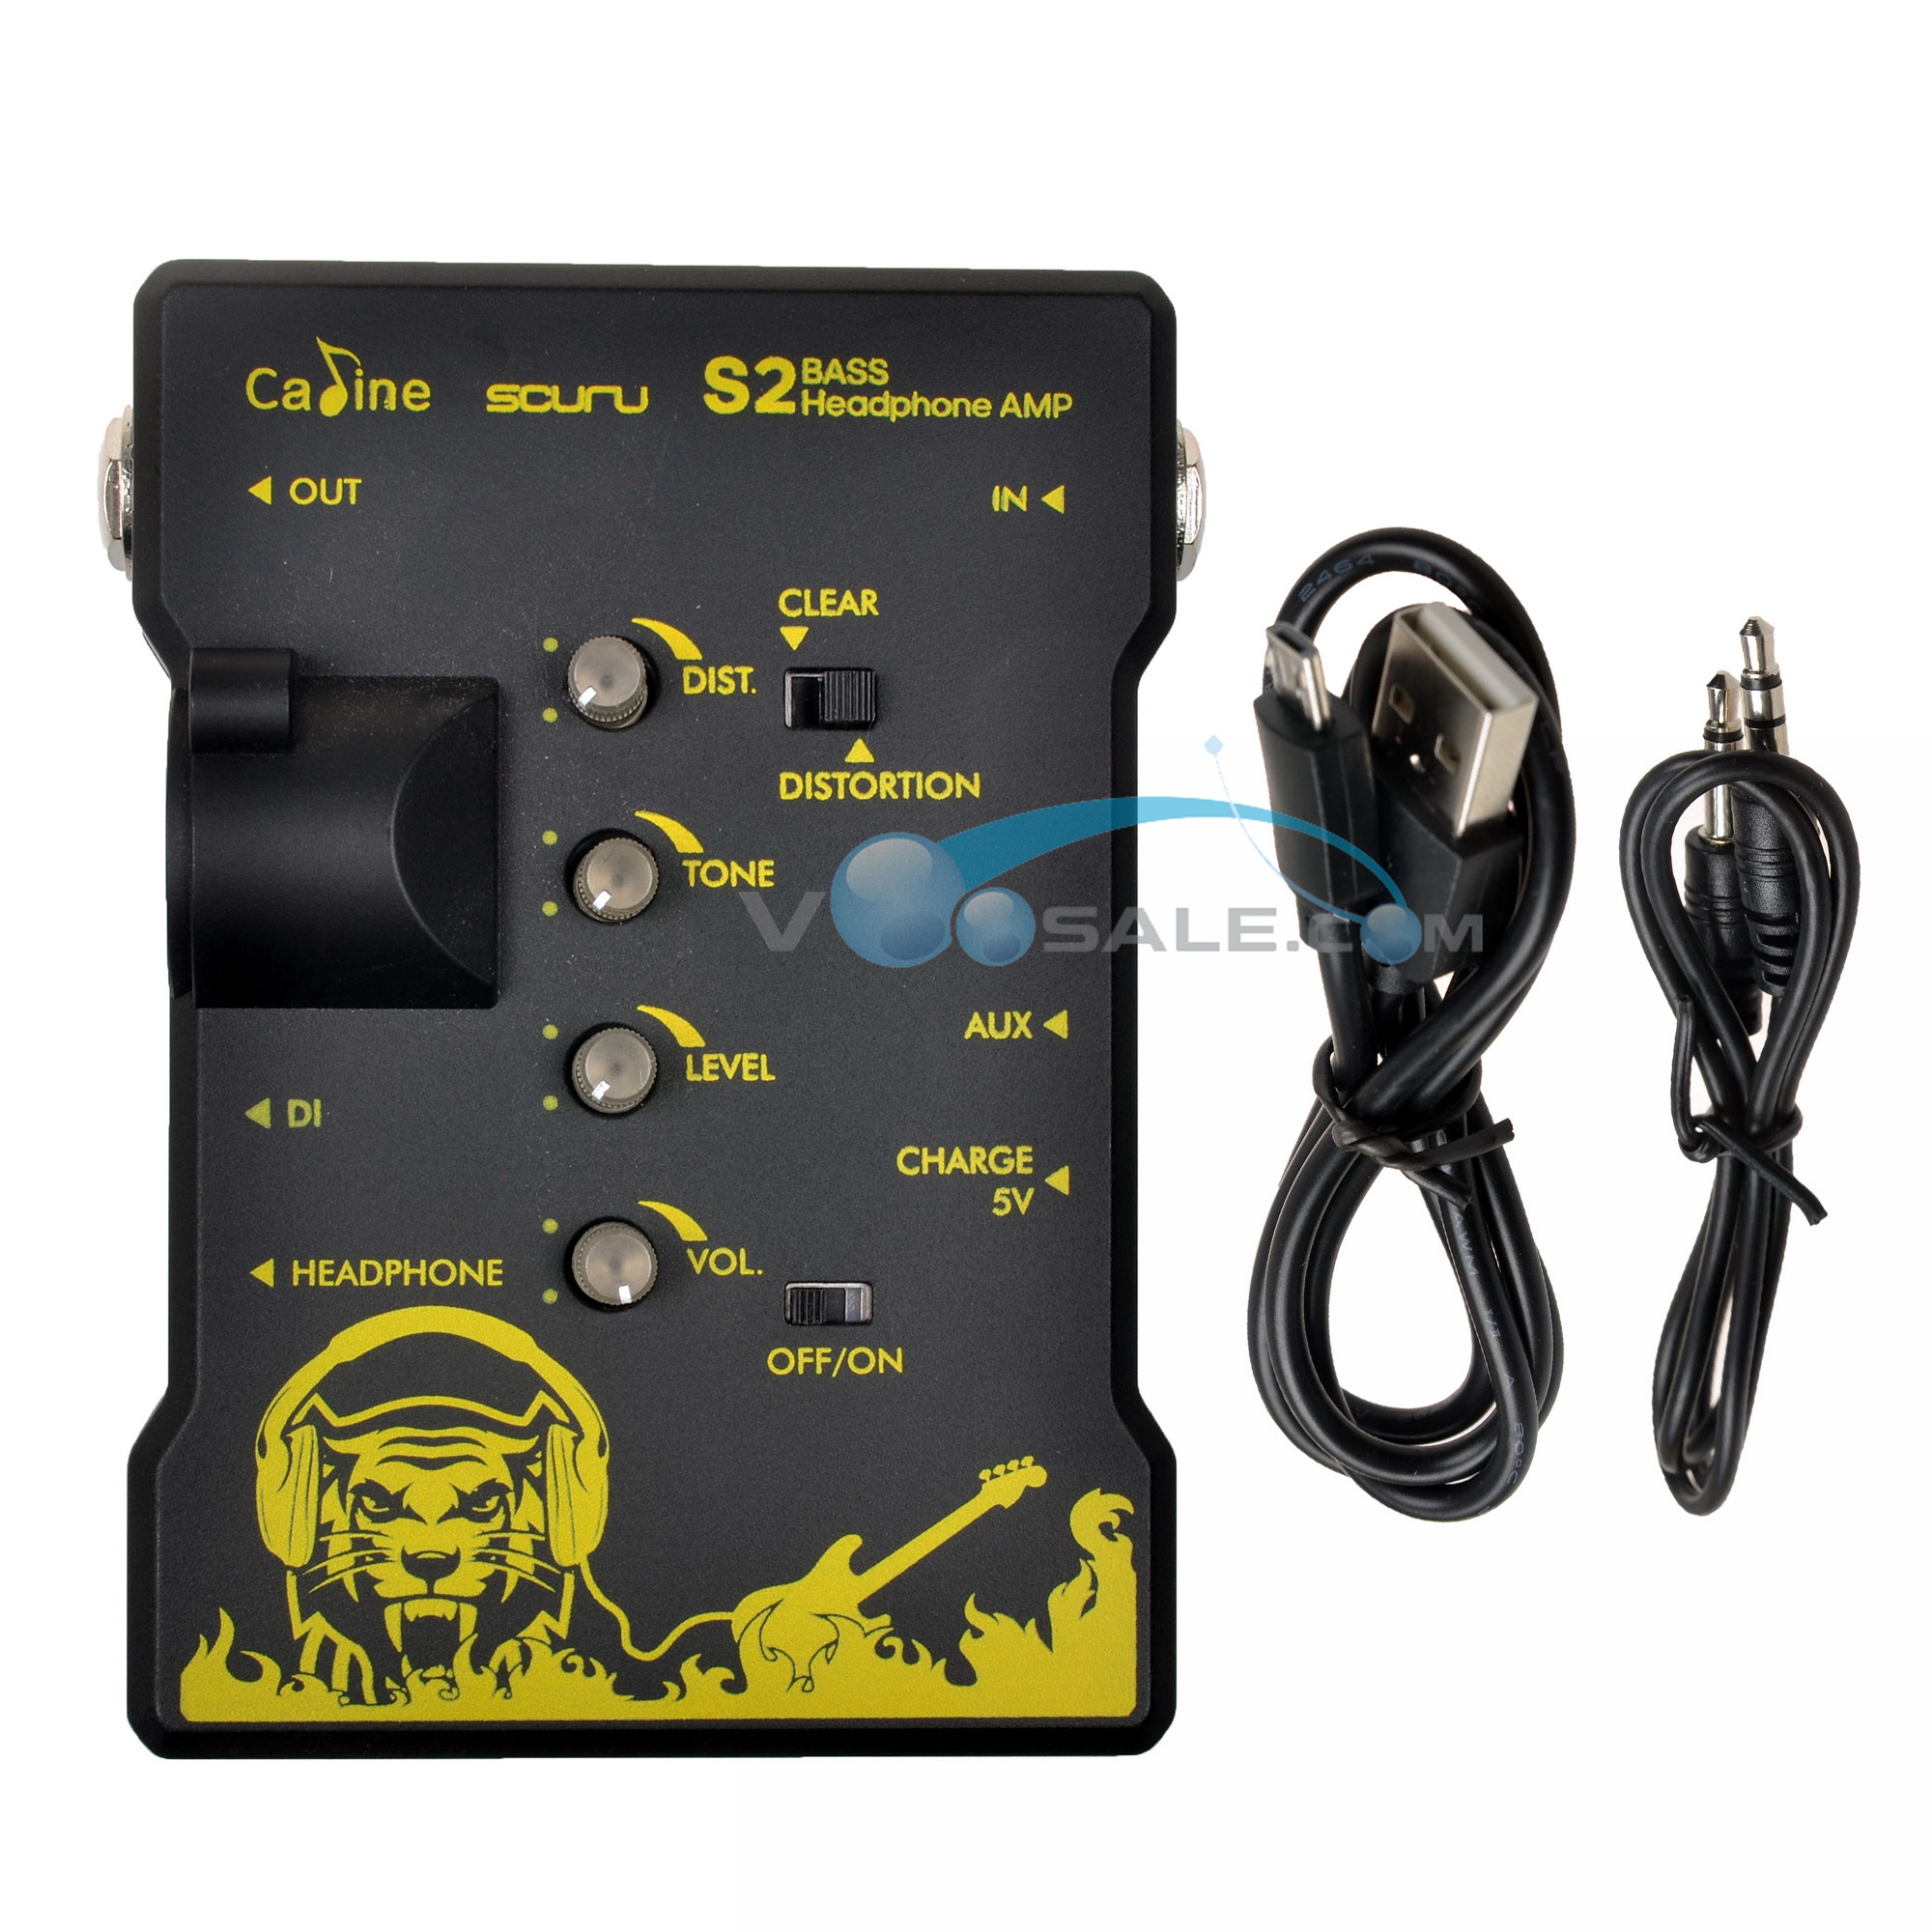 Caline S2 Bass Headphone AMP Guitar Accessories Guitar Parts XLR Output Recharge Headphone Good Quanlity